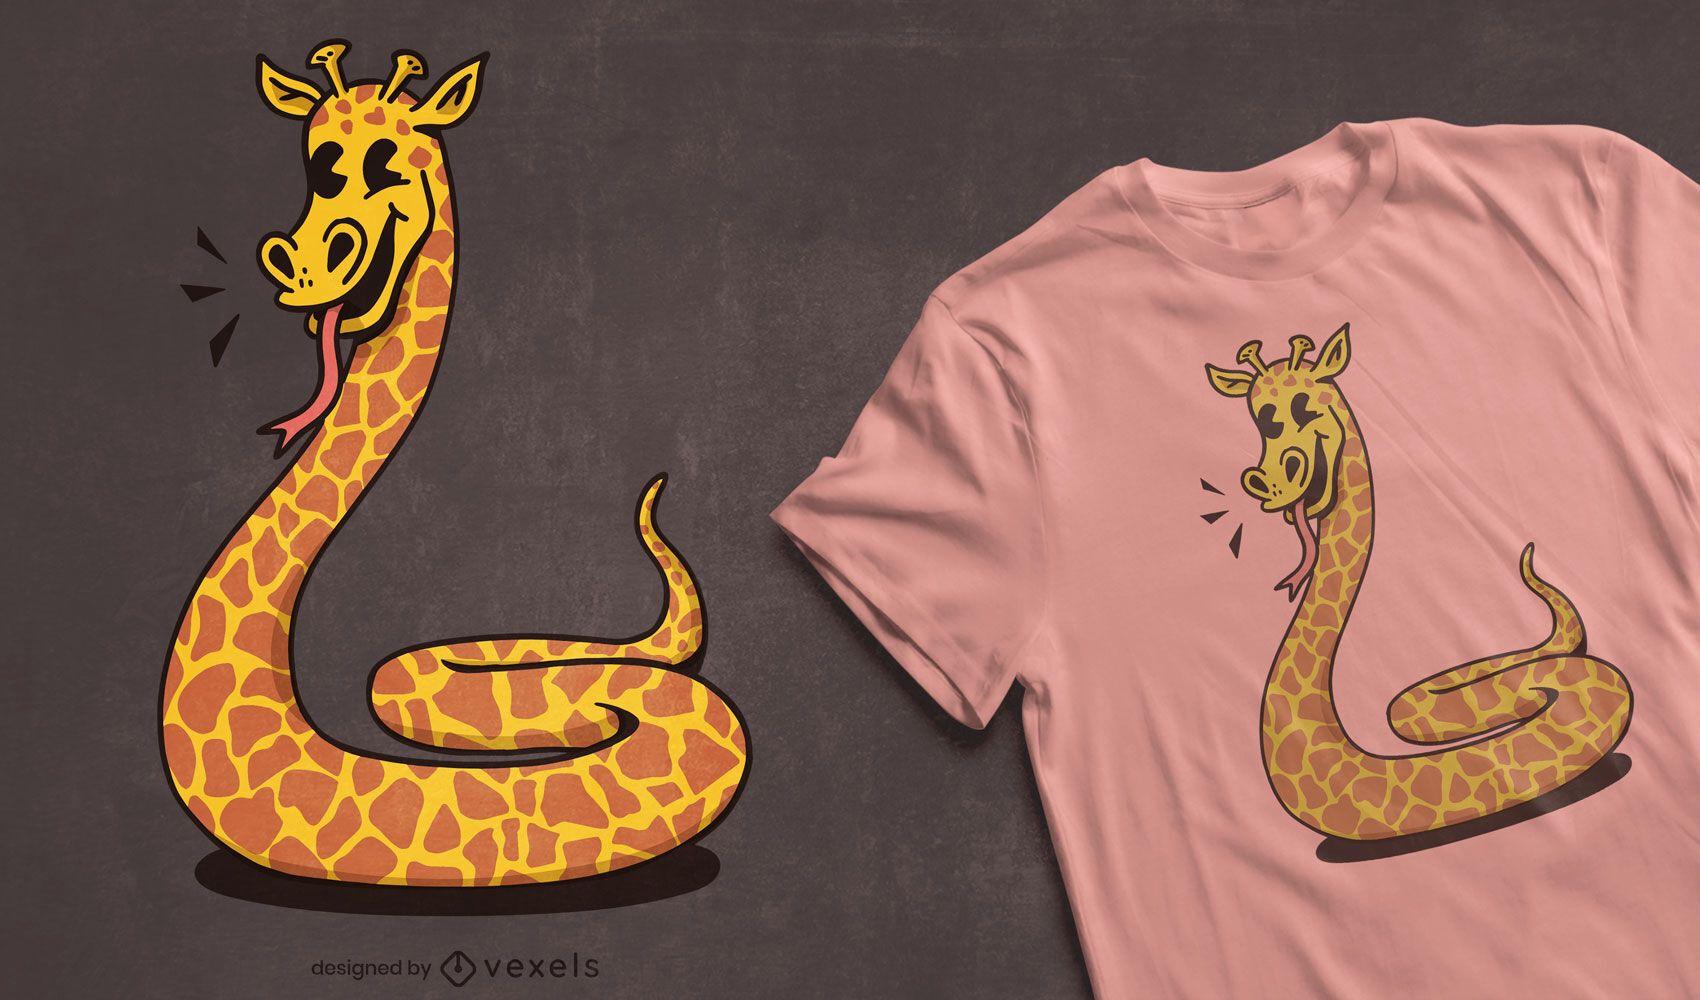 Snake giraffe t-shirt design